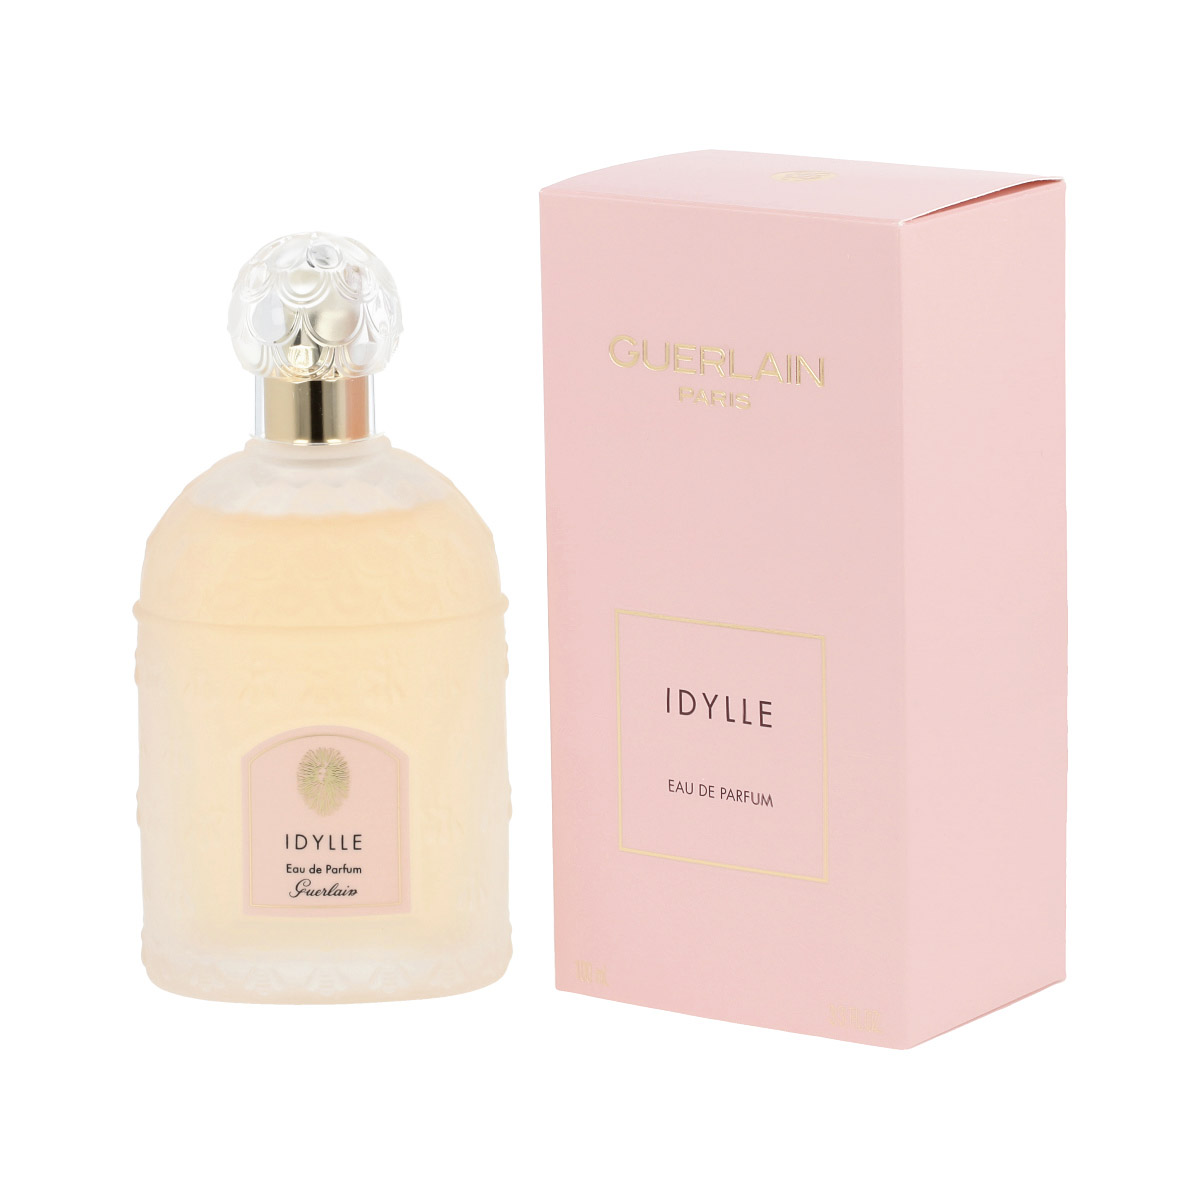 Guerlain Idylle Eau De Parfum 100 ml (woman) 15325